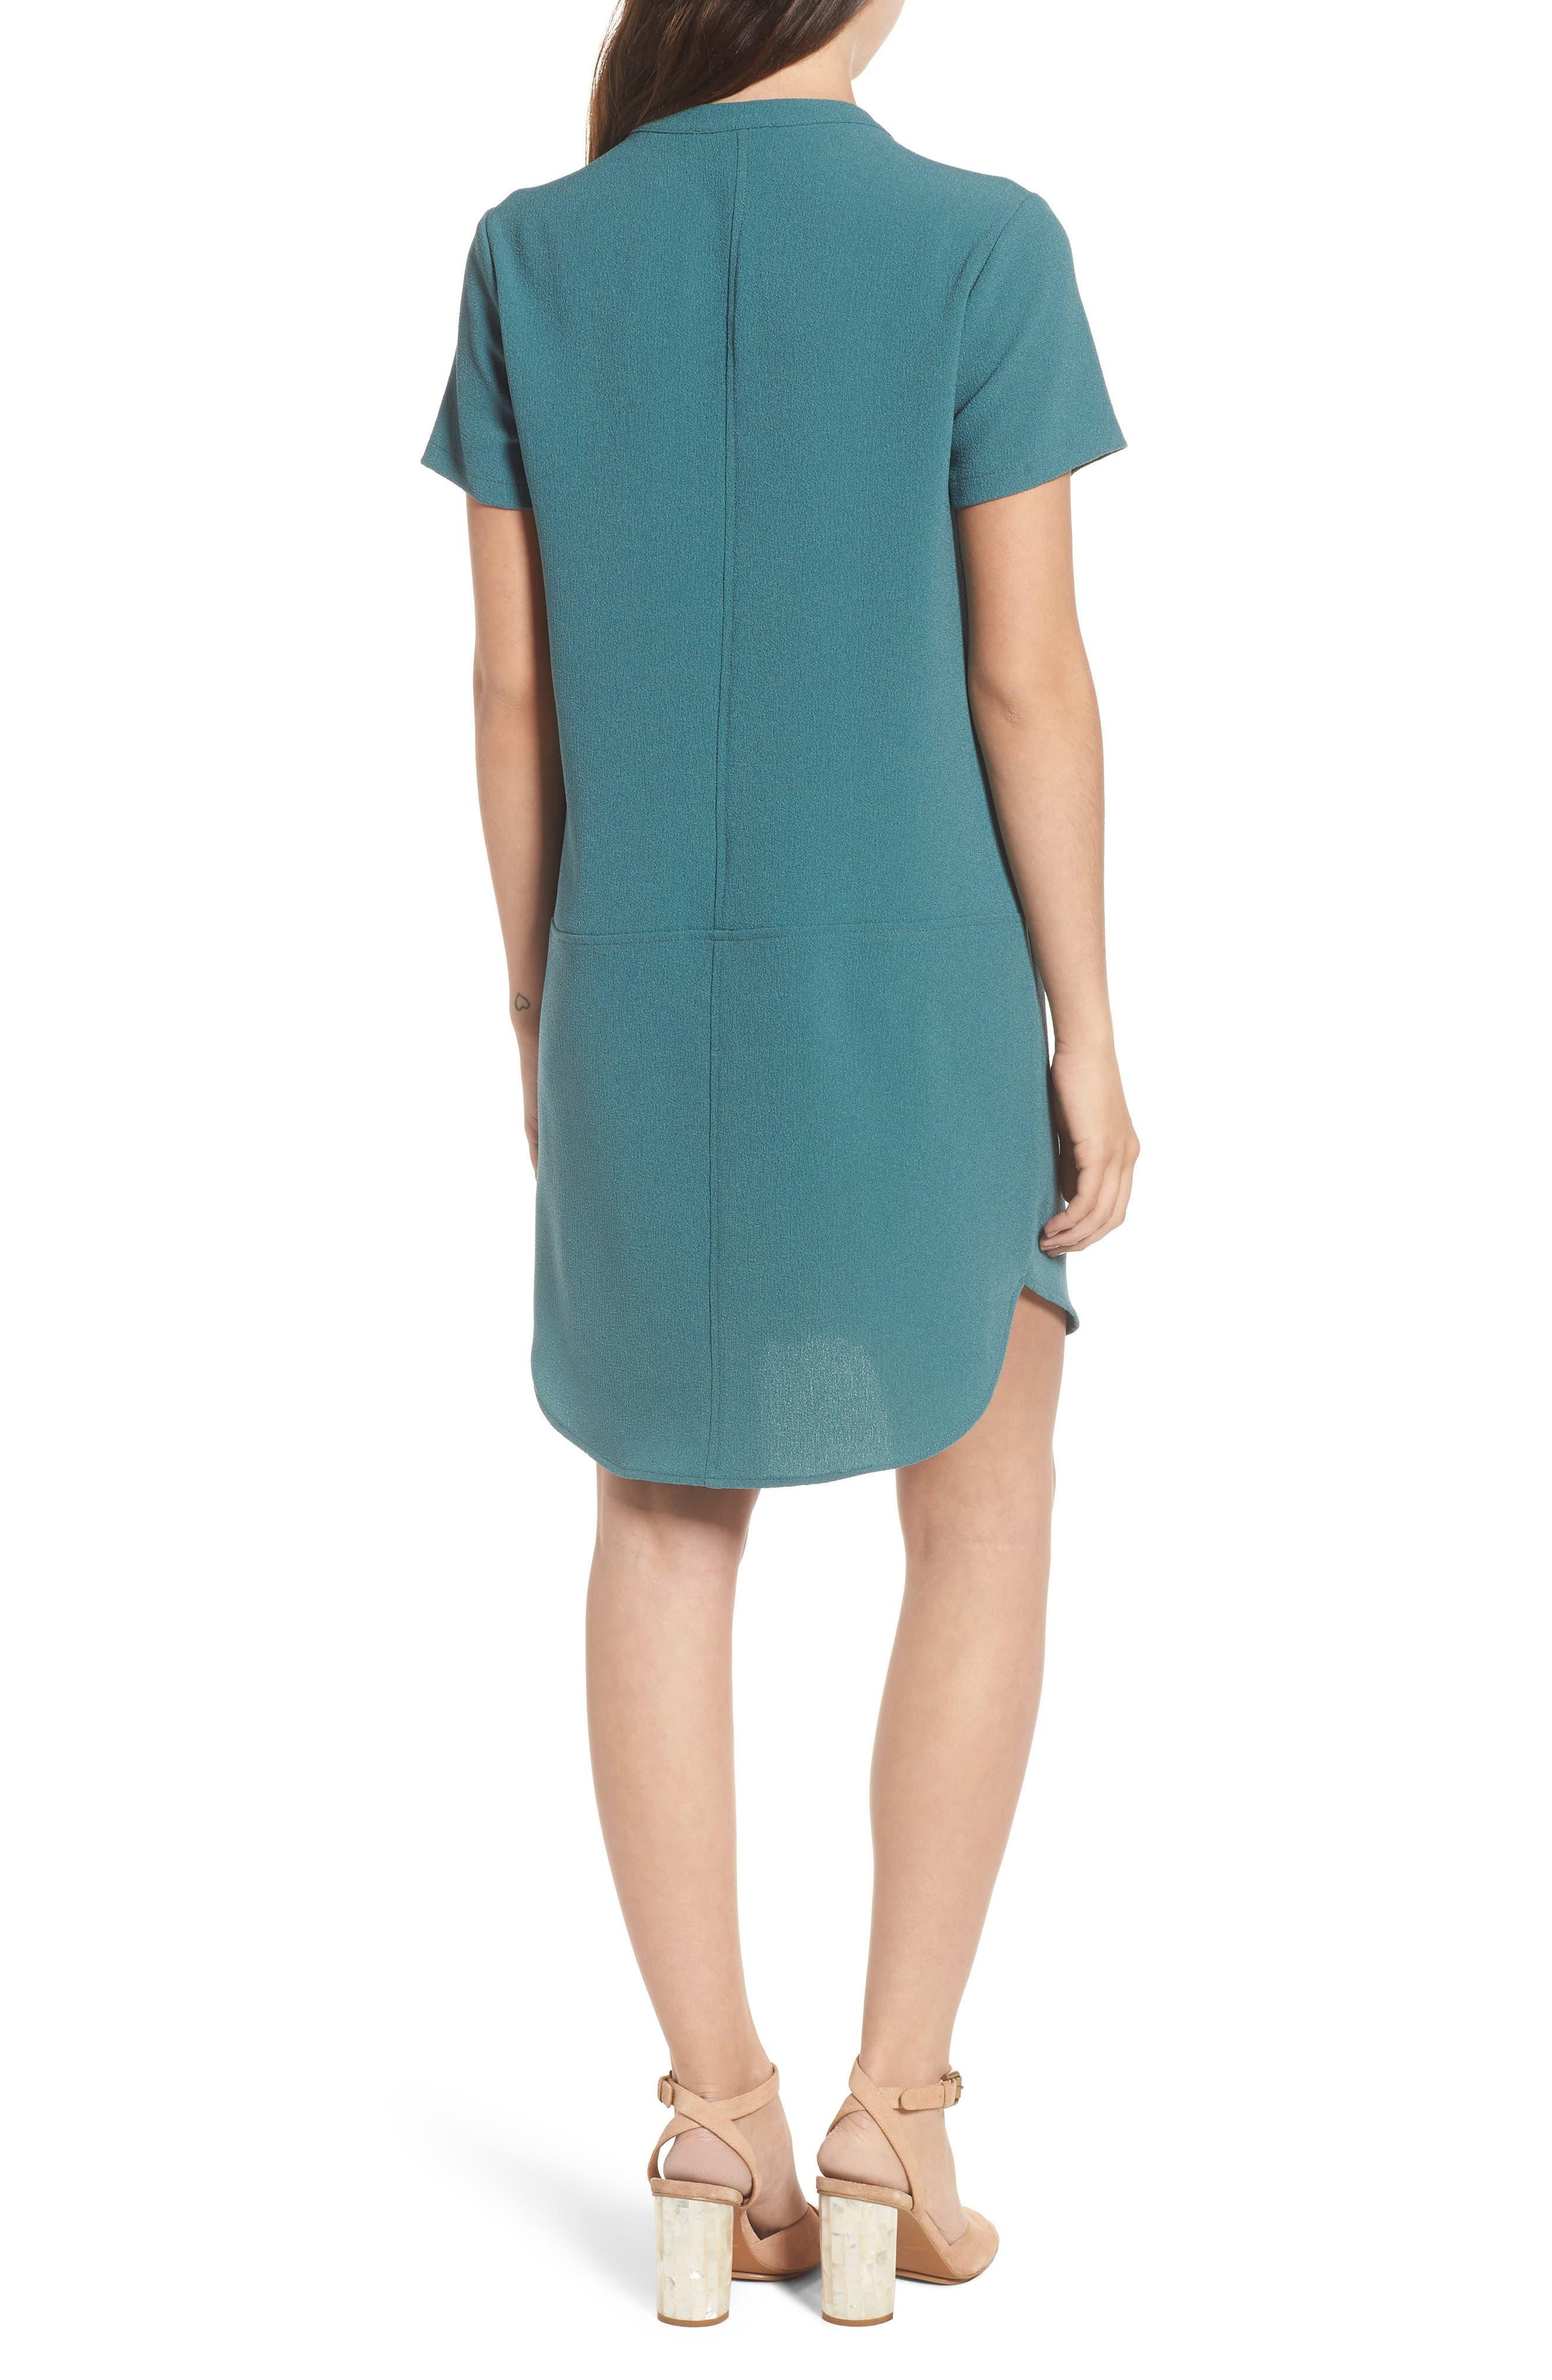 Hailey Crepe Dress,                             Alternate thumbnail 2, color,                             HYDRO TEAL